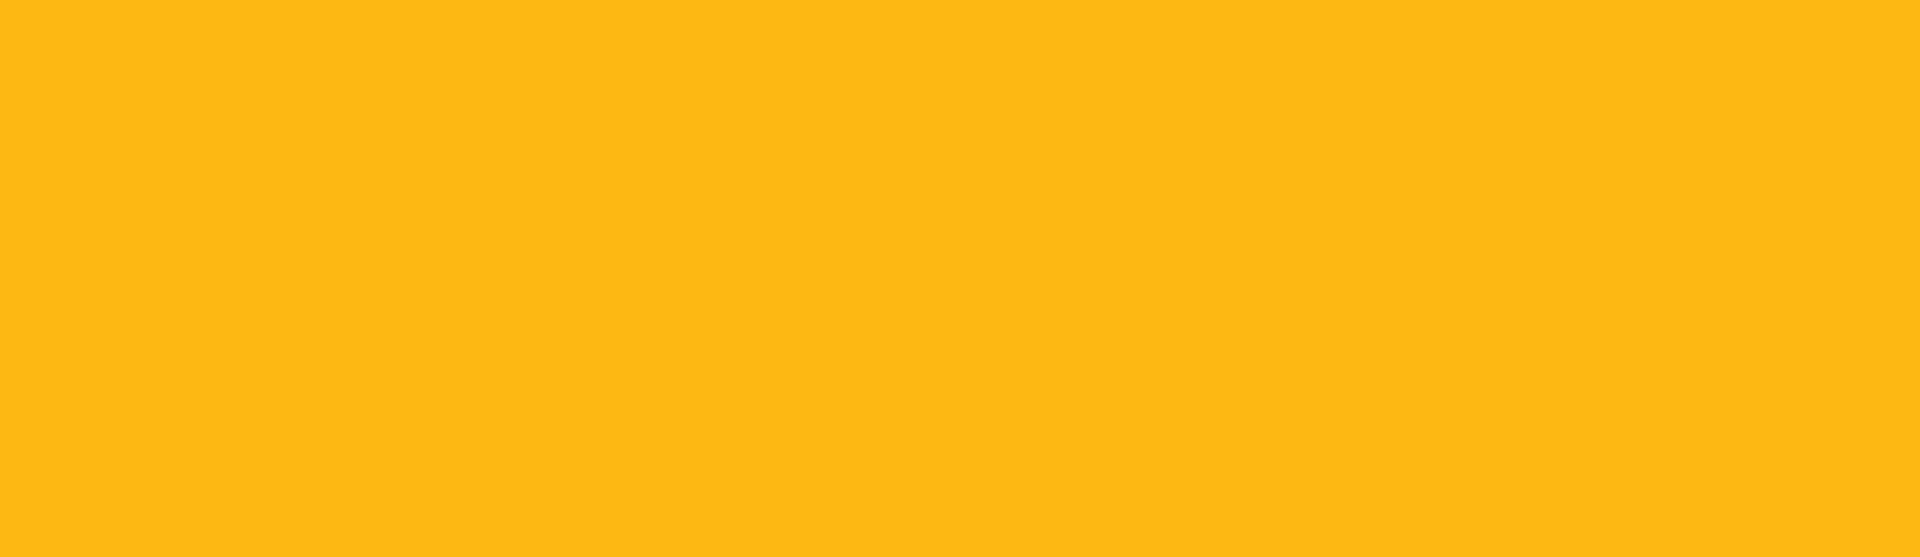 ajandek tarsas slide 02 yellow